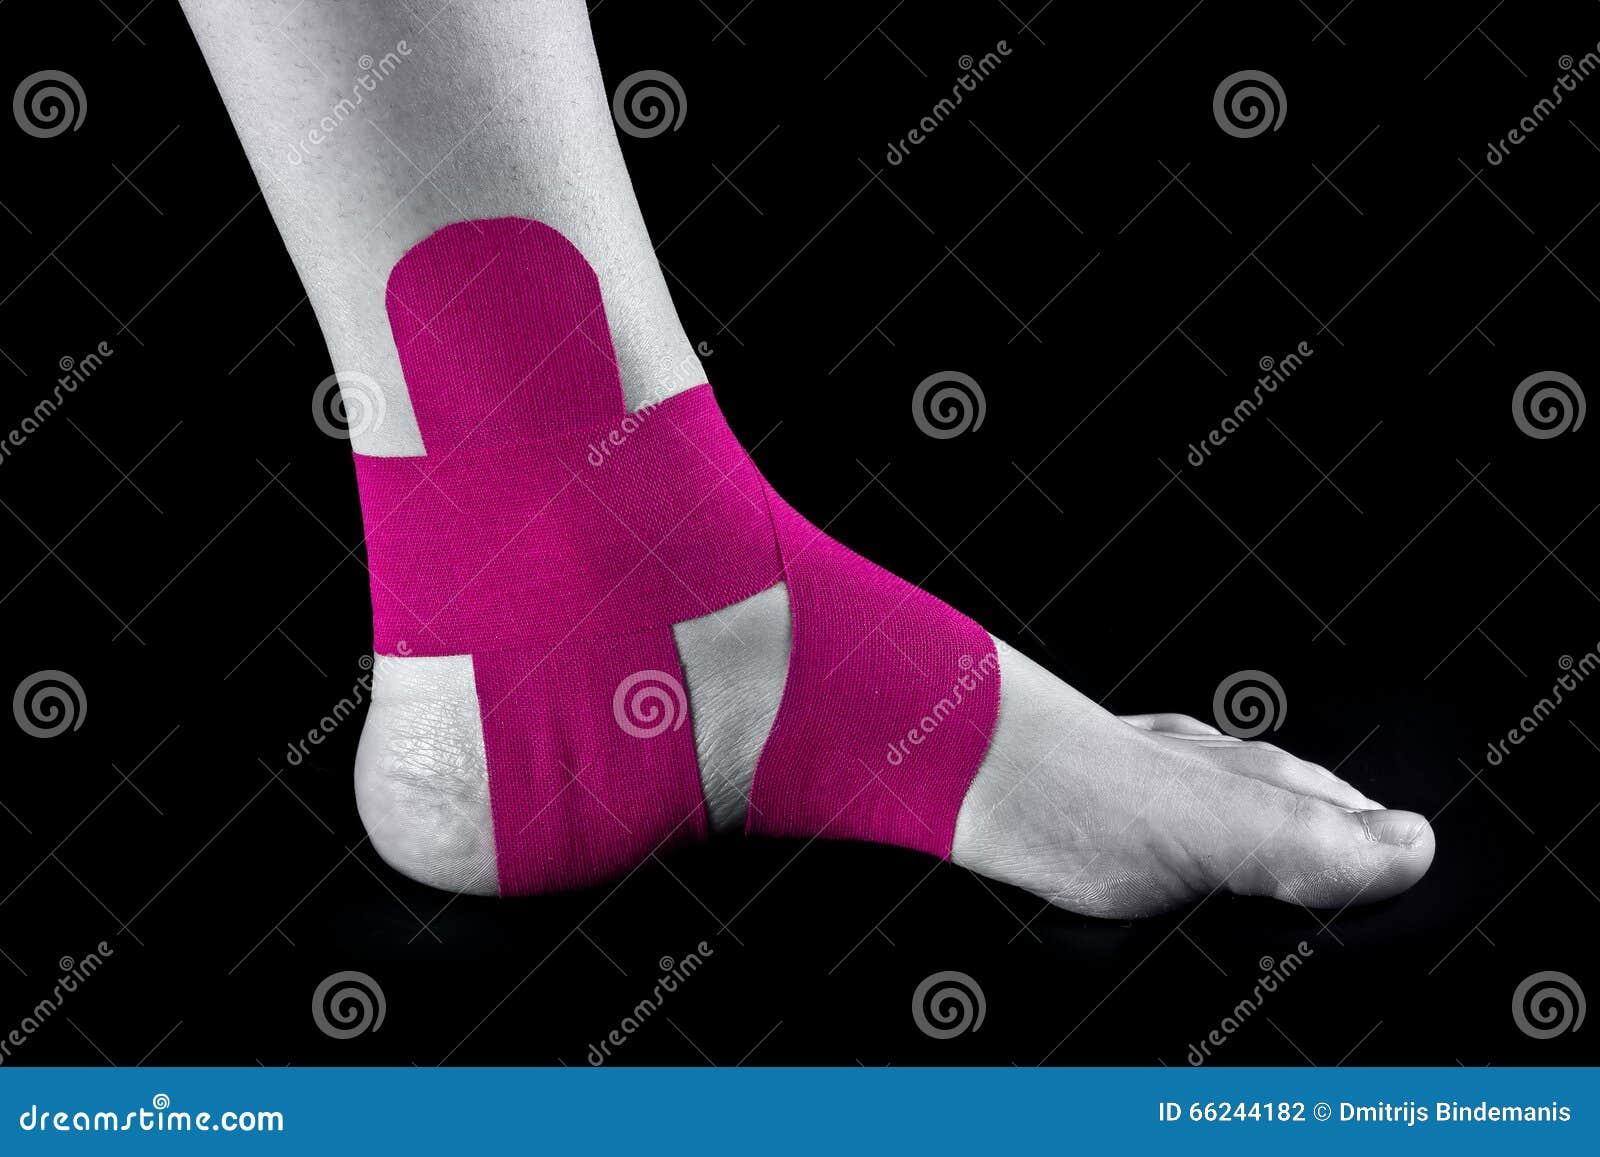 Medical Taping Stock Photo - Image: 66244182